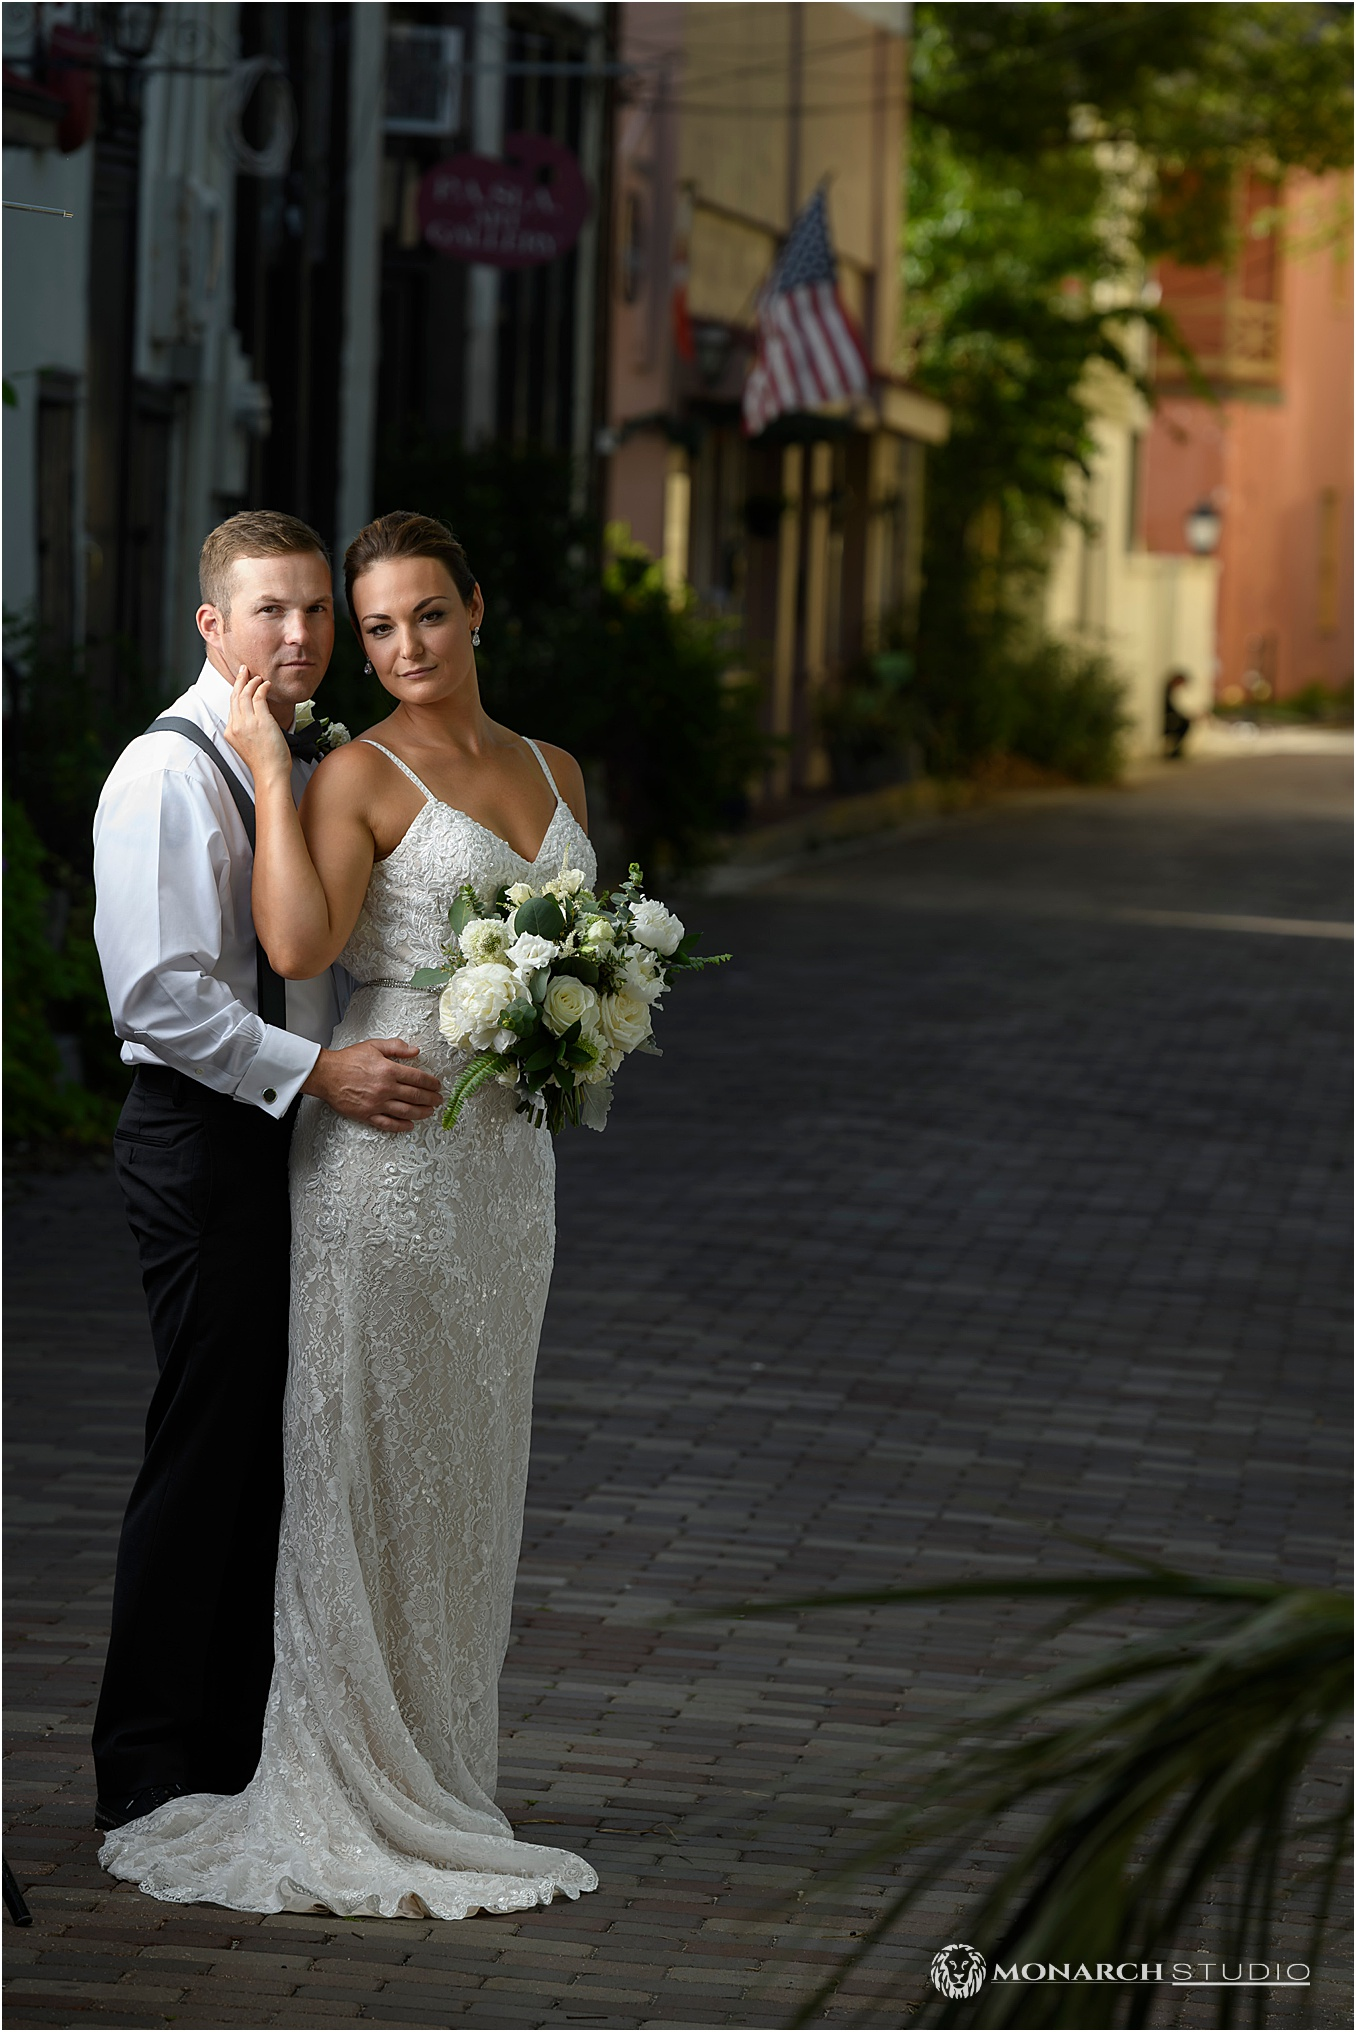 050-whiteroom-wedding-photographer-2019-05-22_0032.jpg